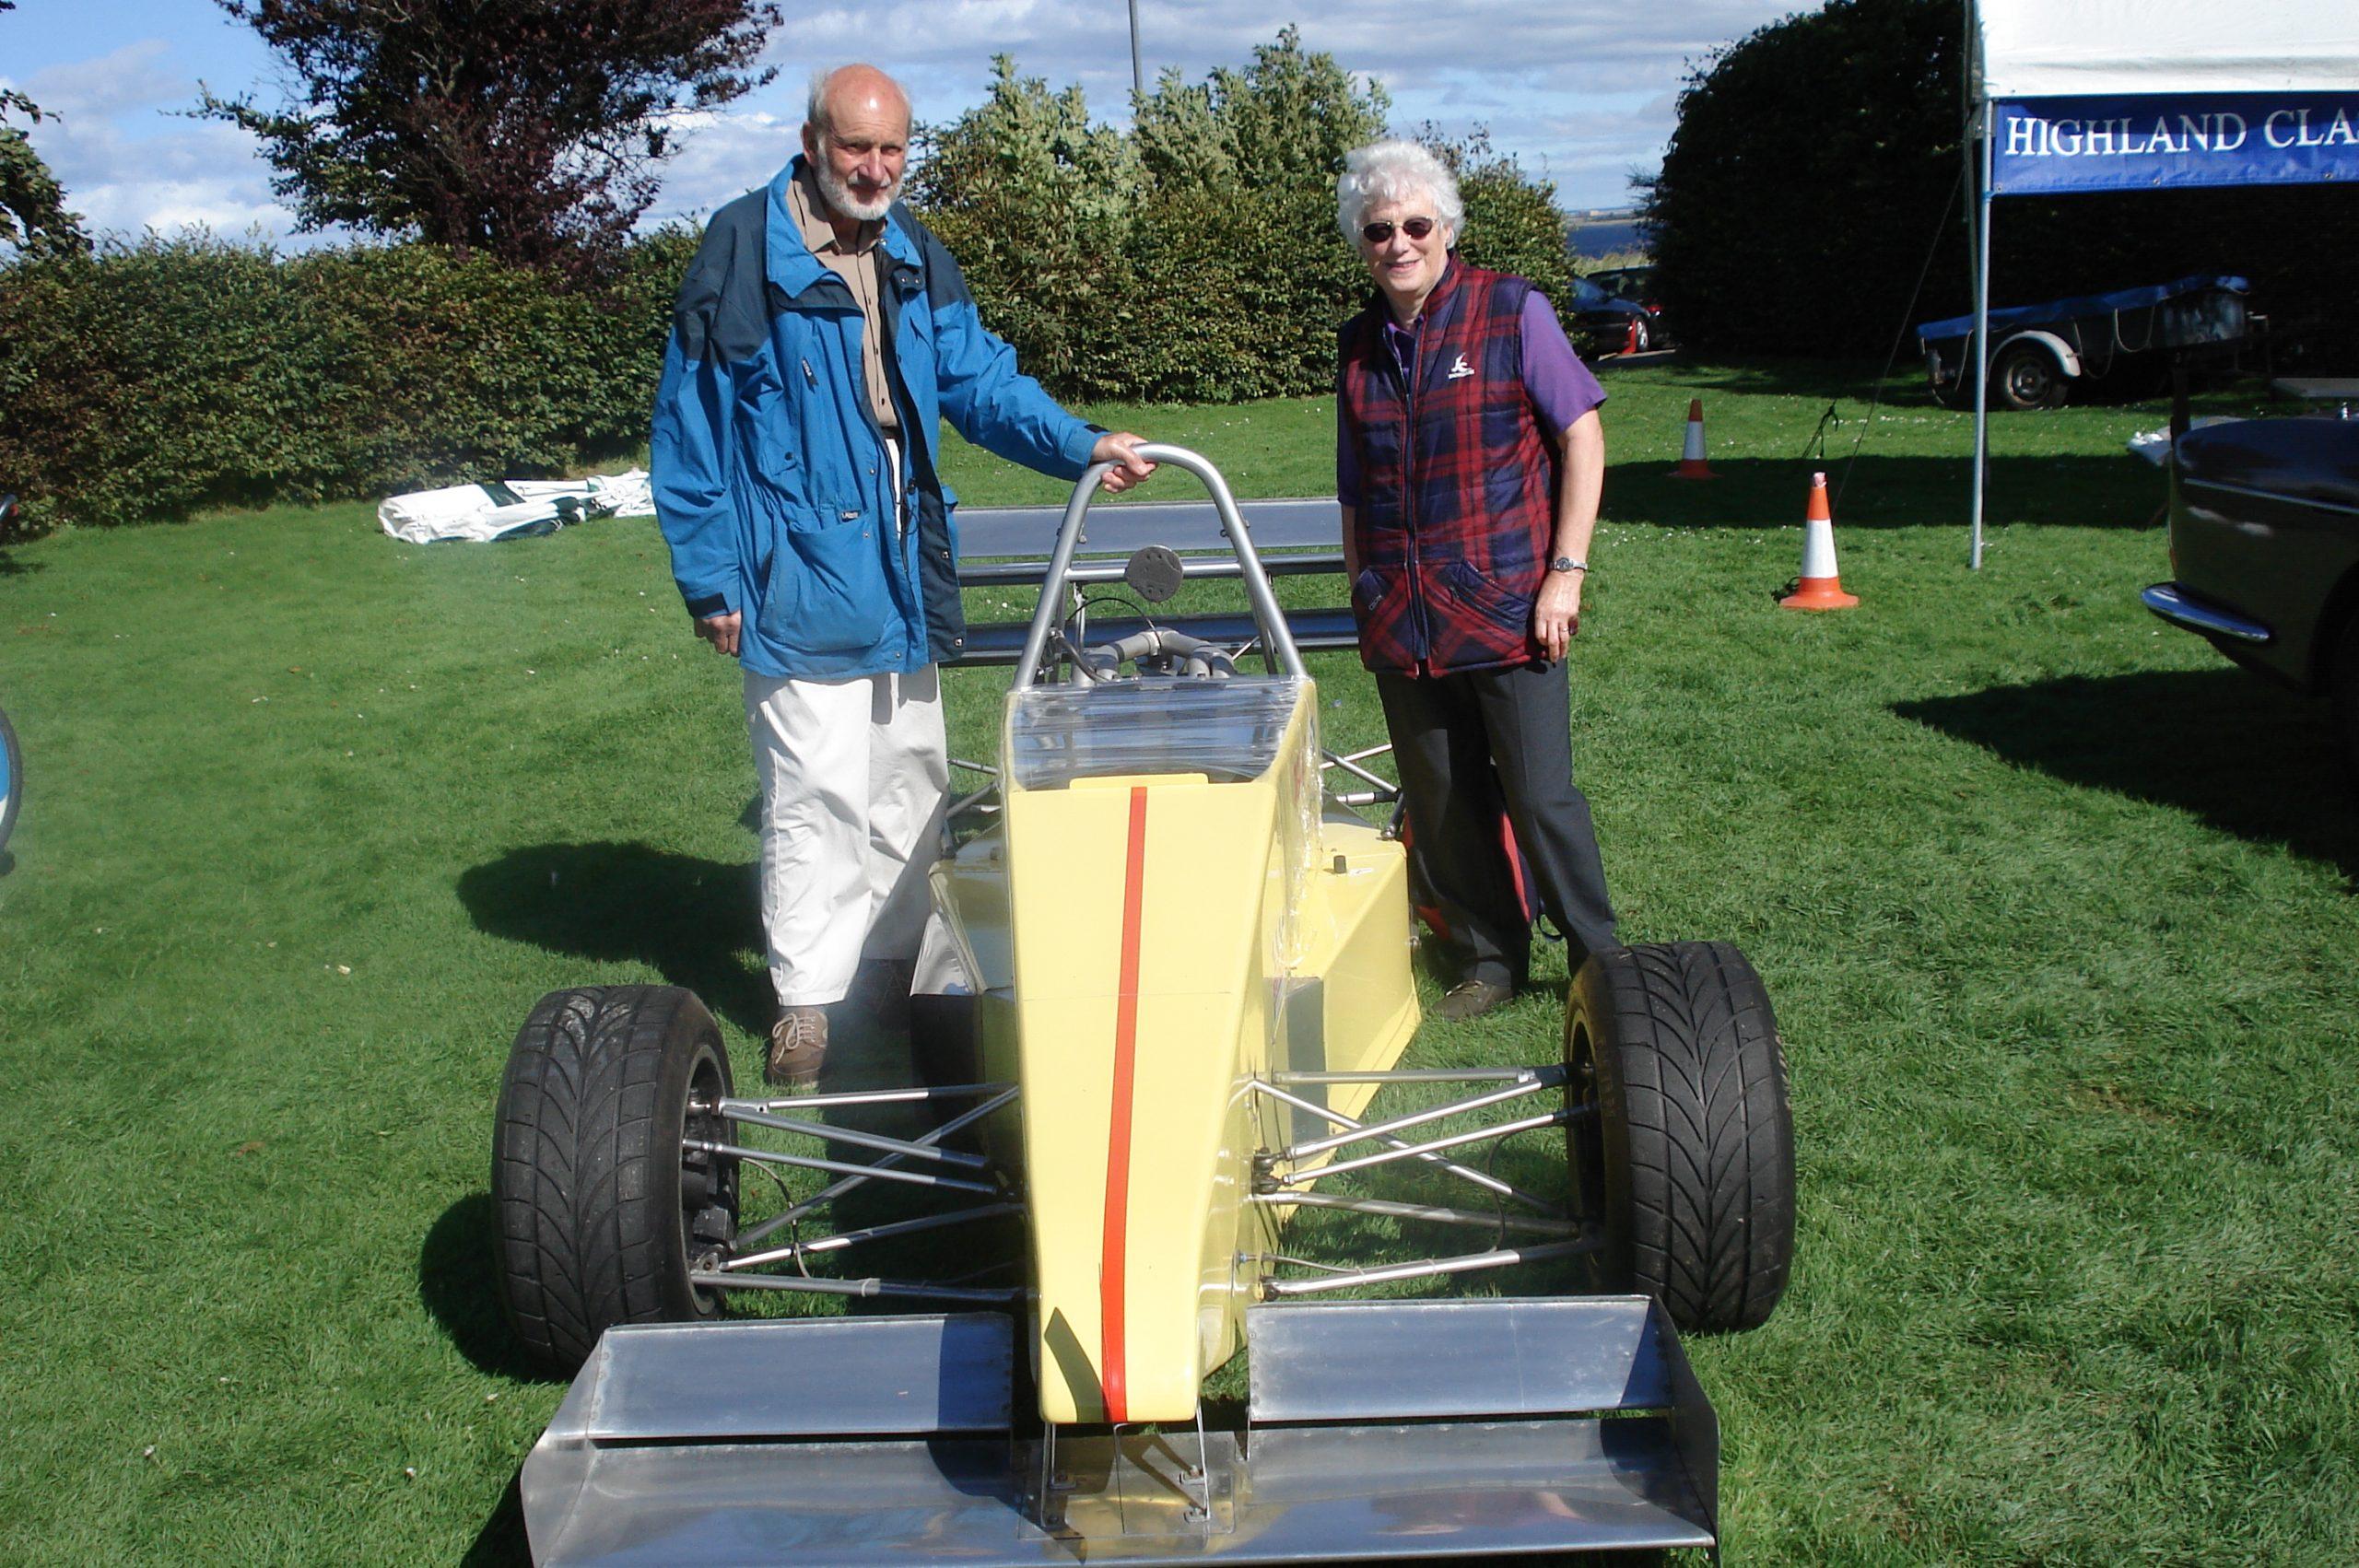 Your Classics: Jim Sword and his Jasag homebuilt racing car